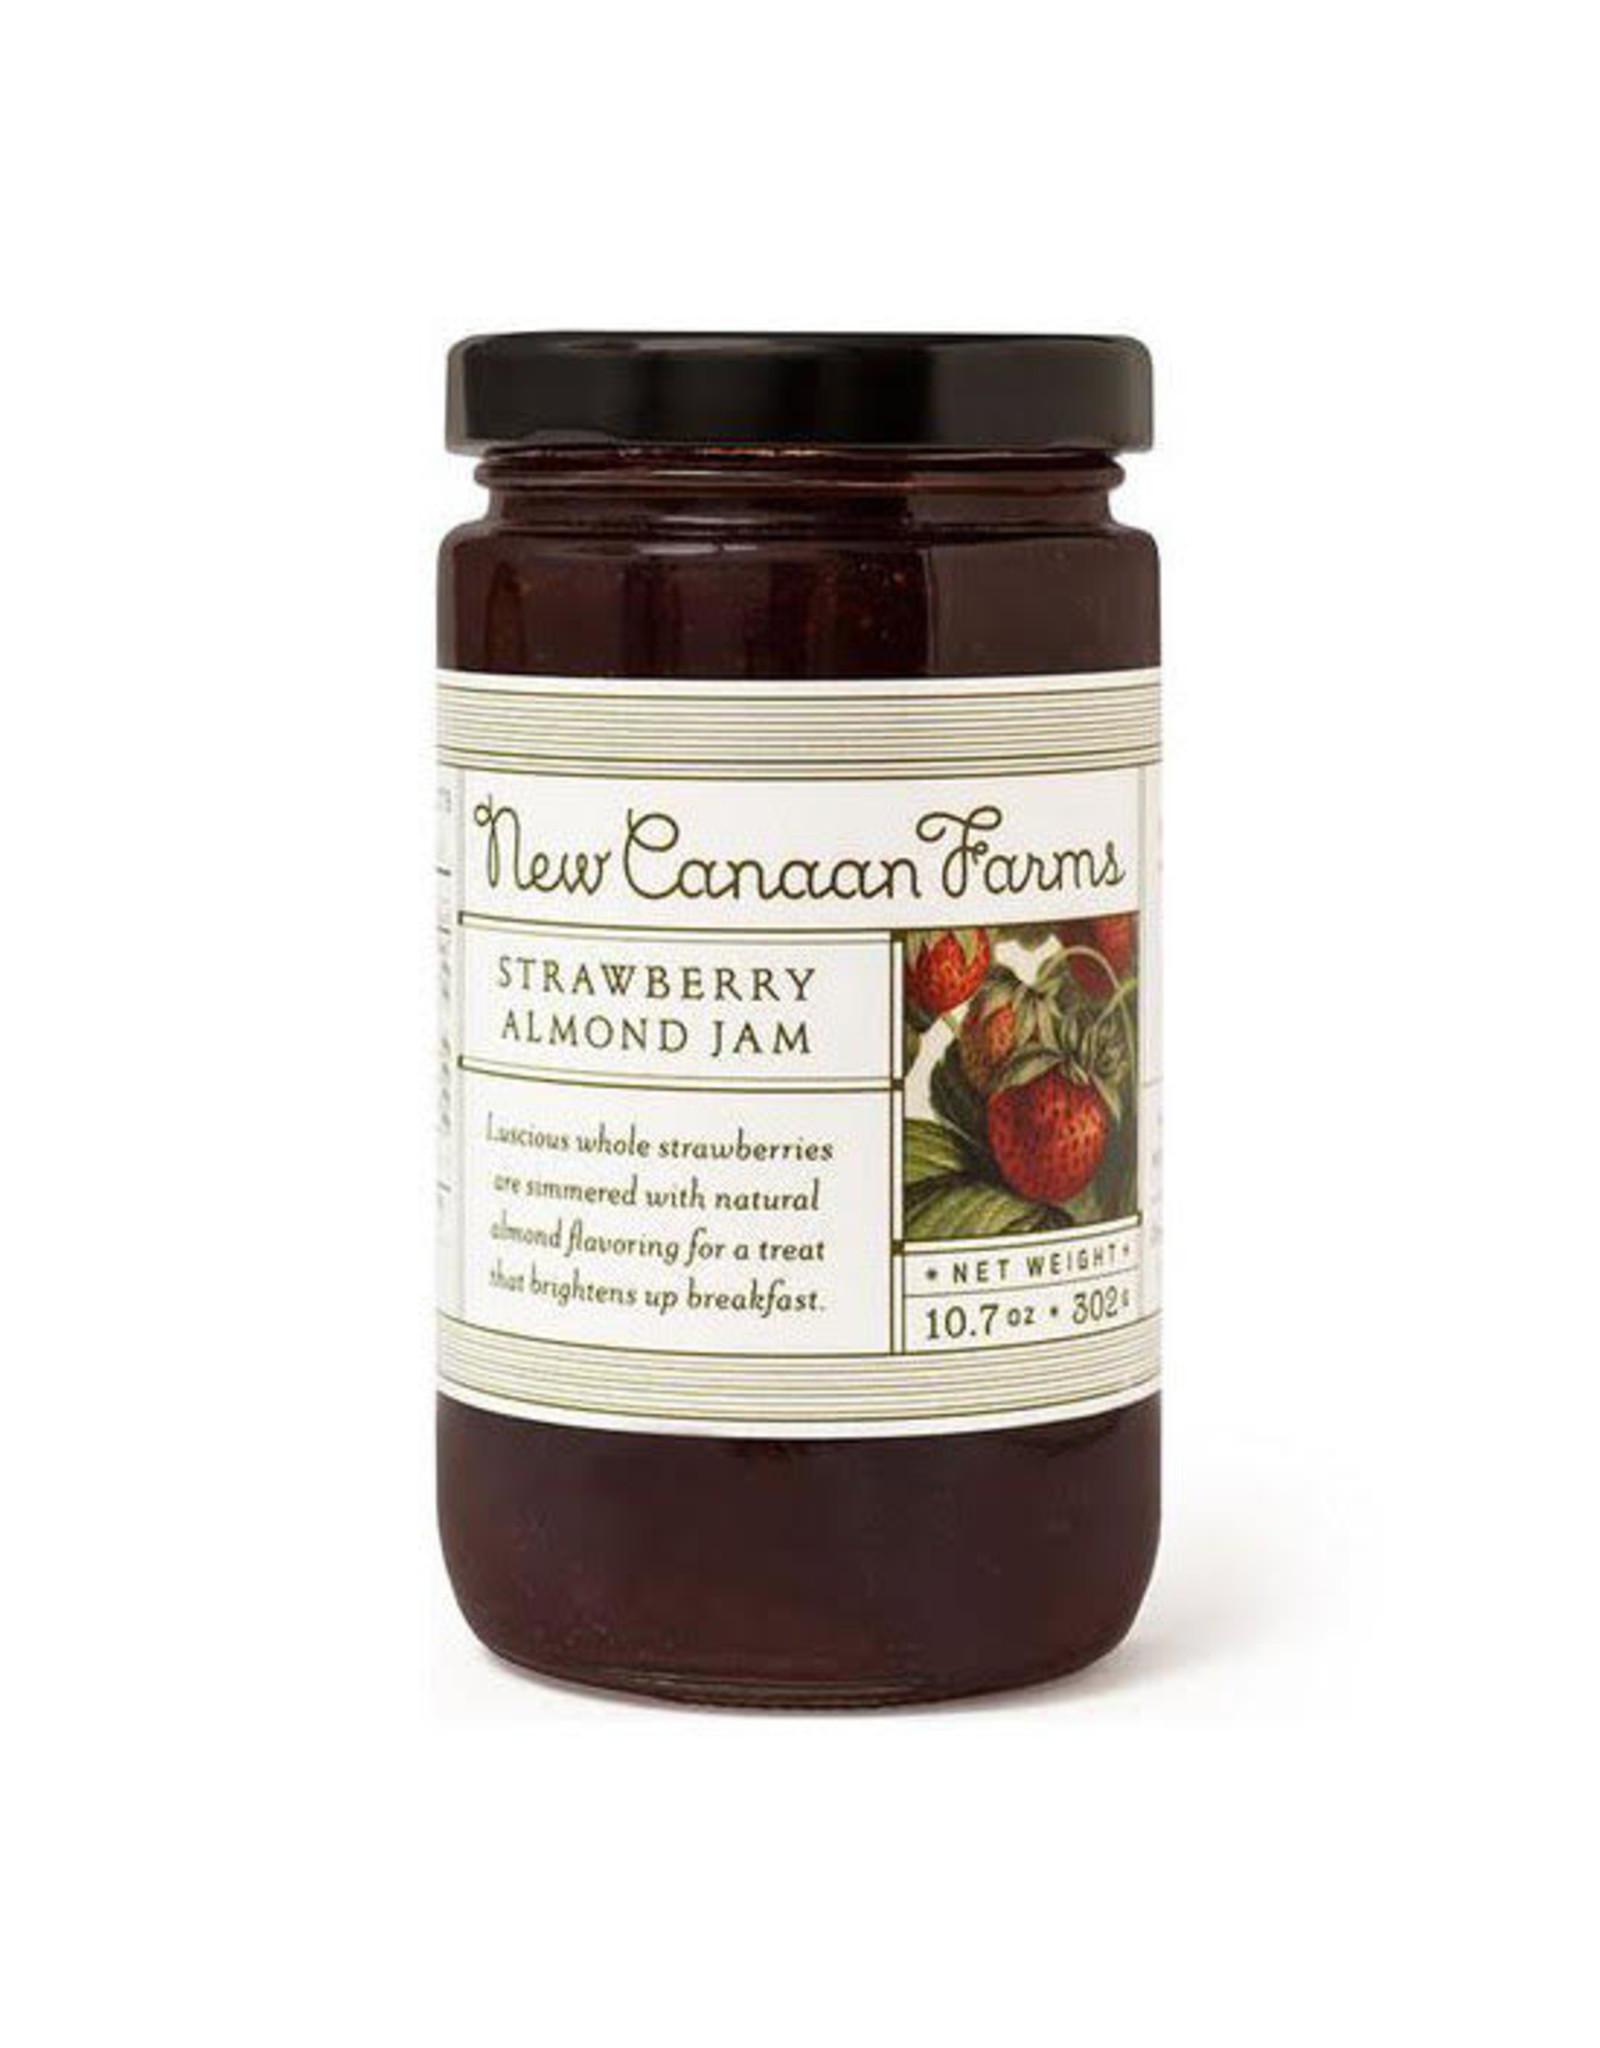 Strawberry Almond Jam